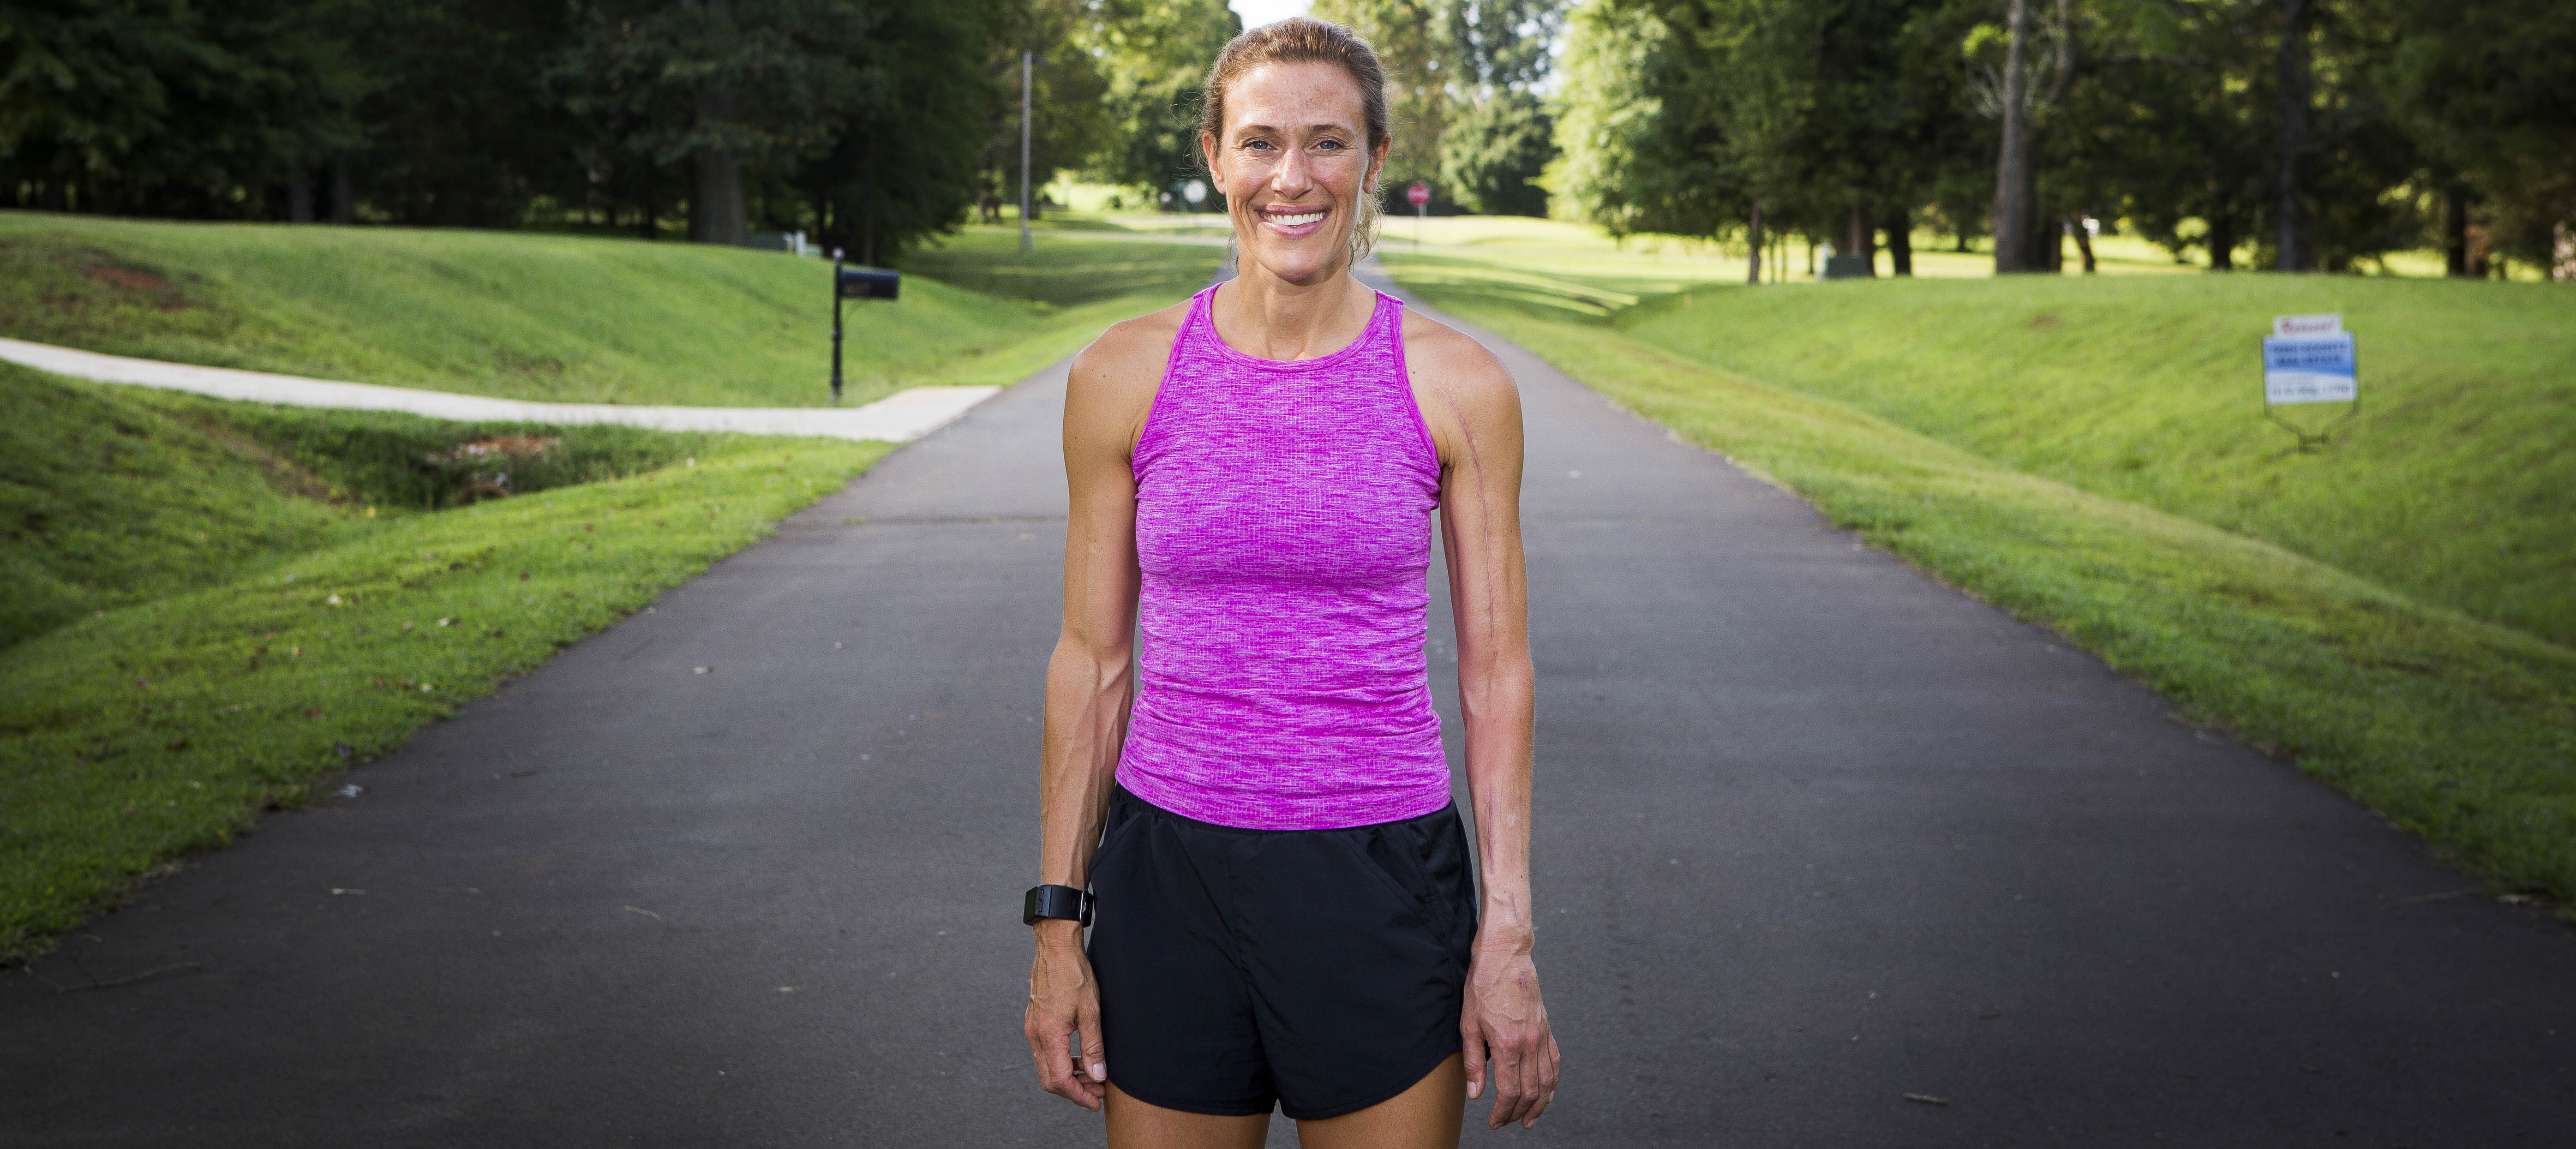 Beth Hufner is training for a marathon after a  devastating injury.